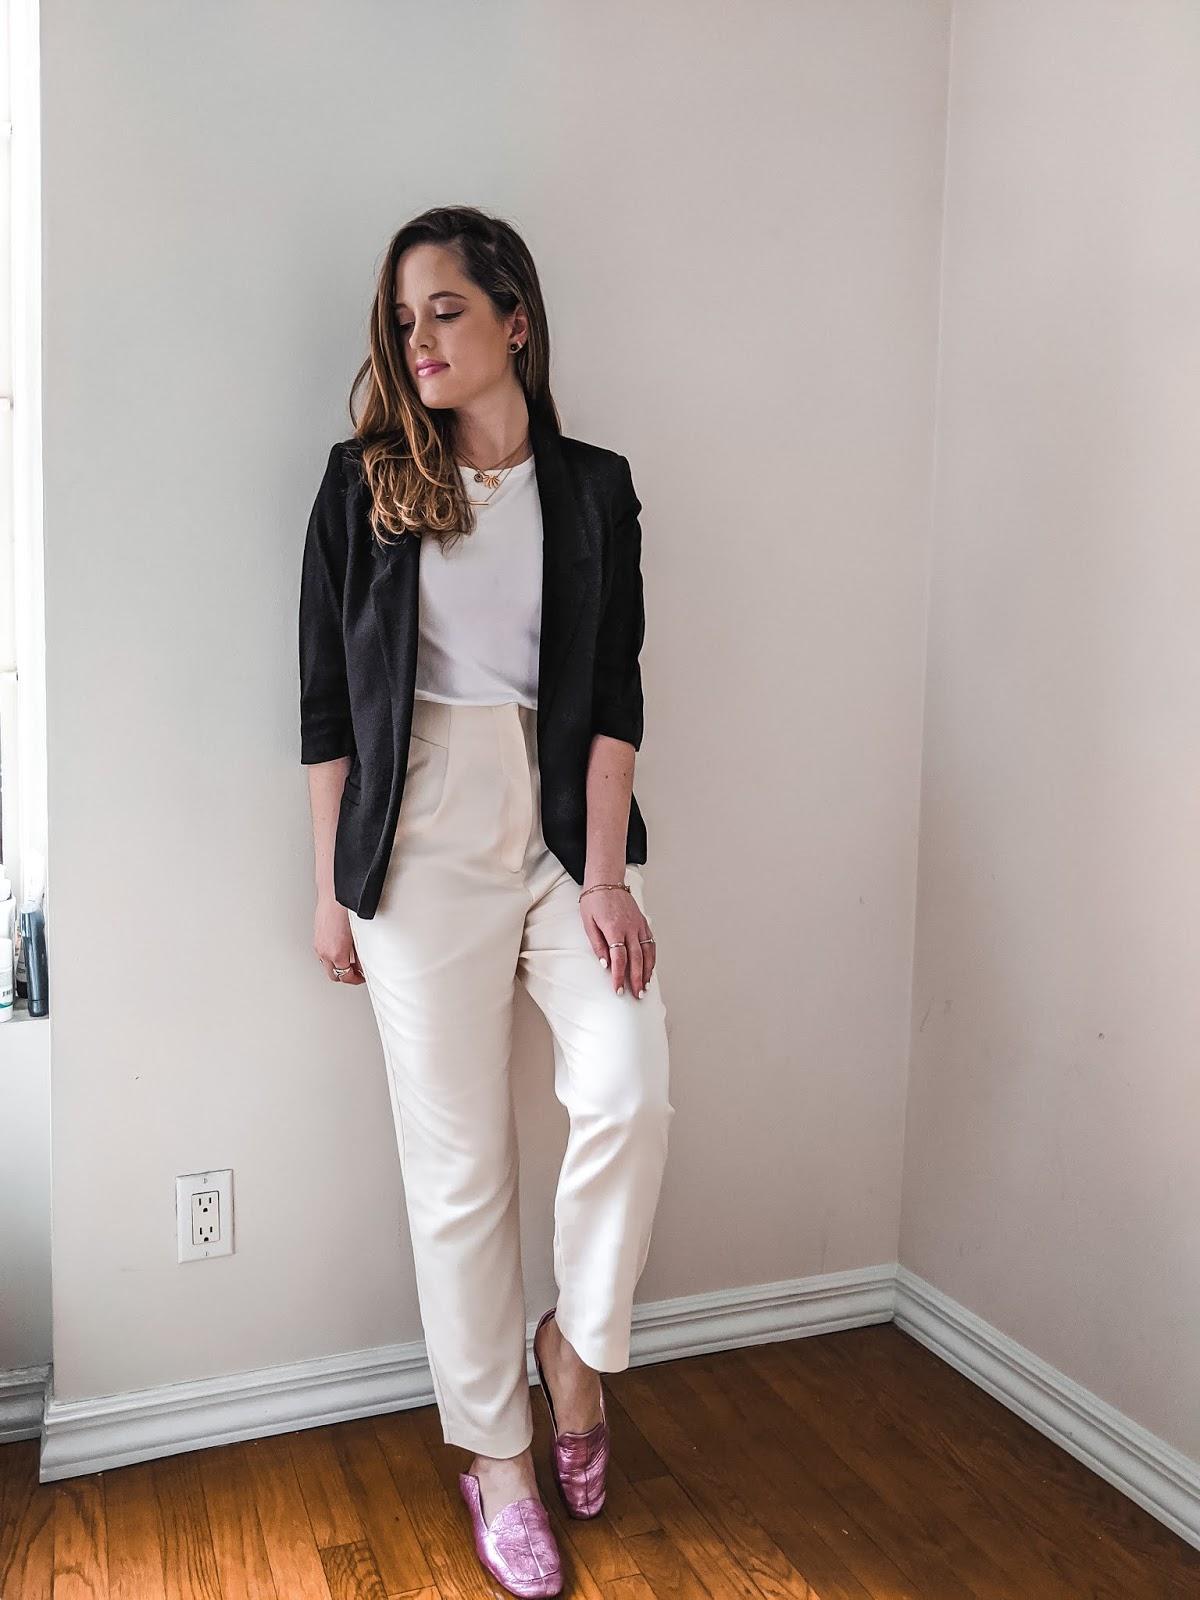 Nyc fashion blogger Kathleen Harper's indoor photo shoot.